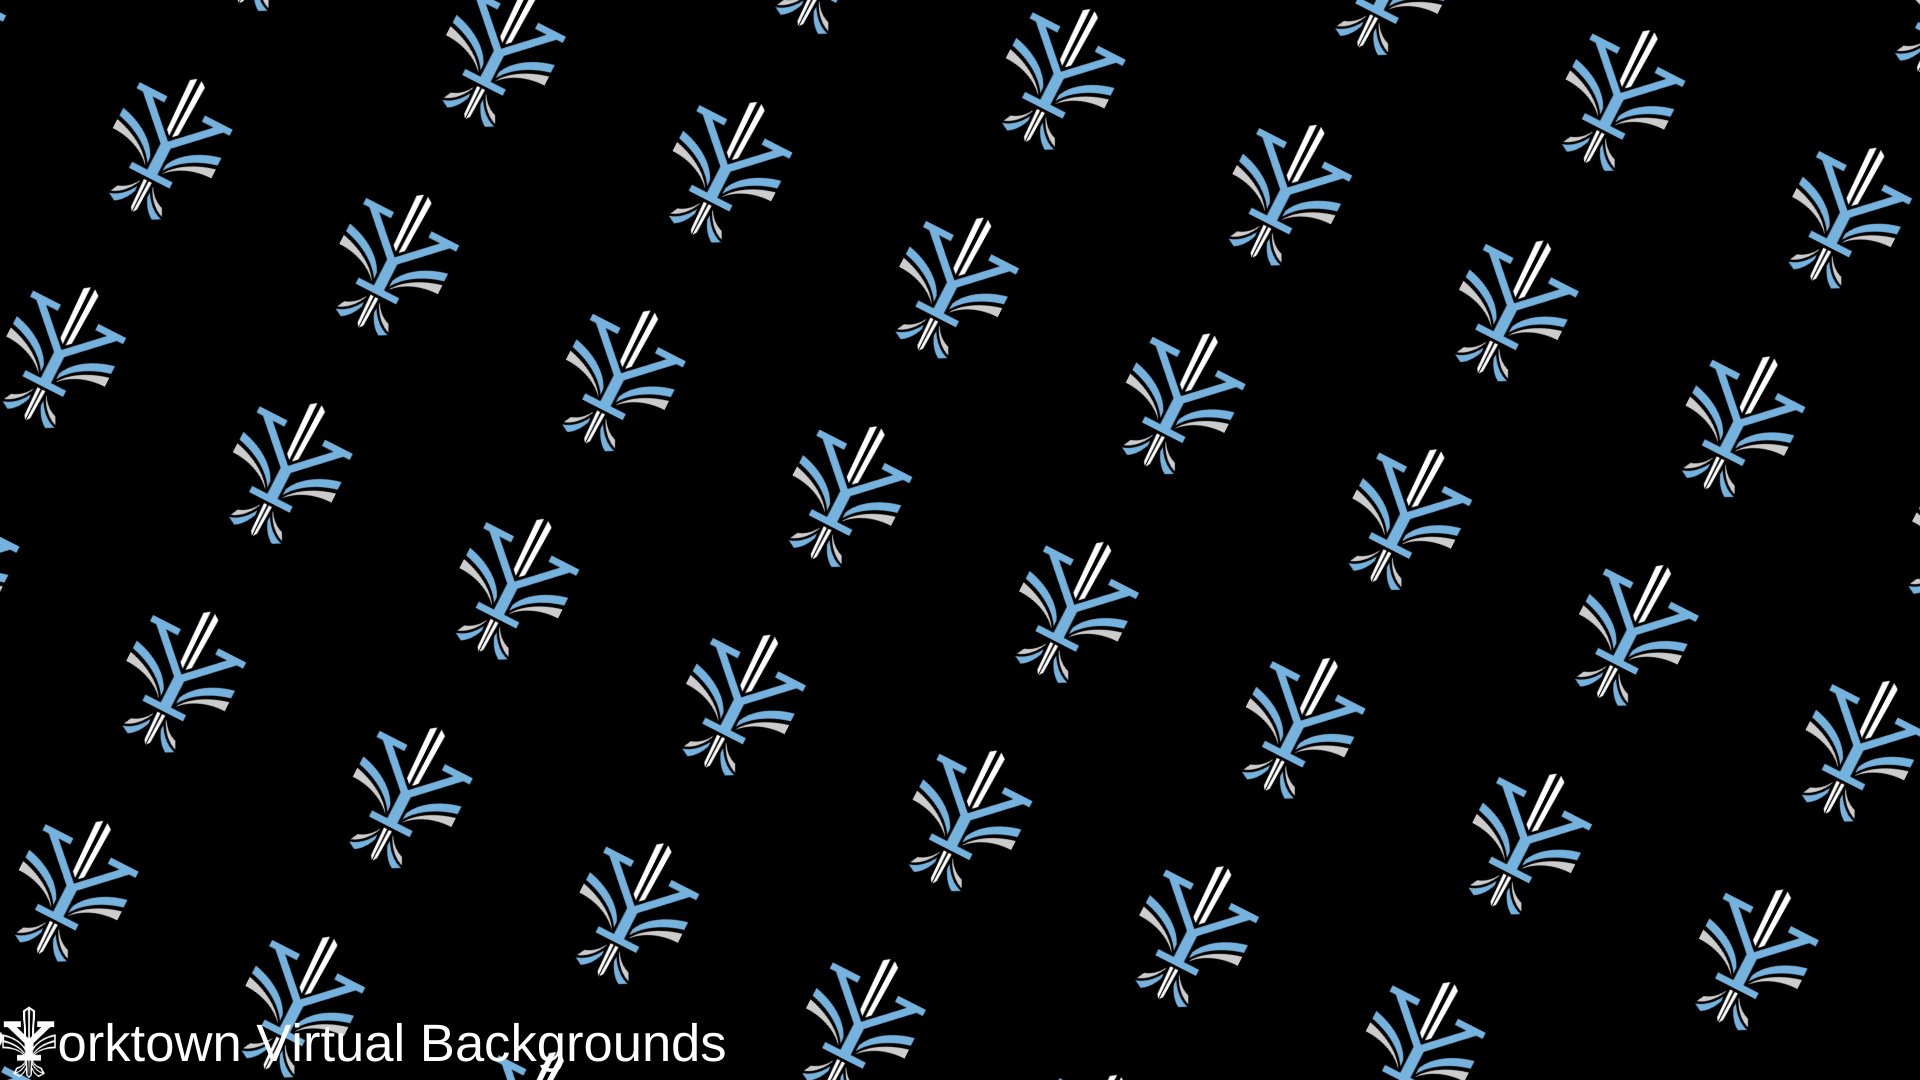 Yorktown Logo Wallpaper for Teams - Black - Diagonal